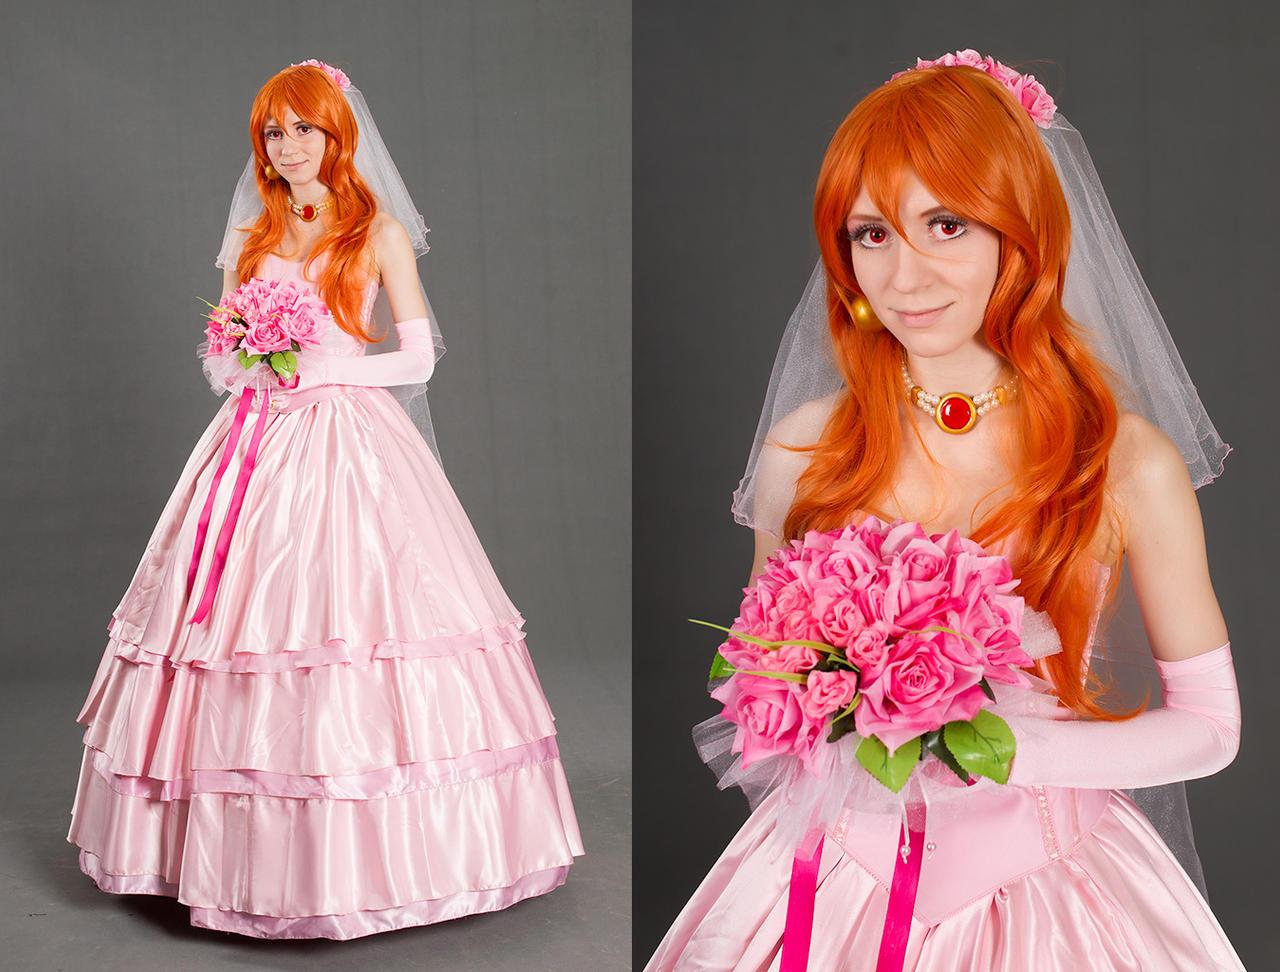 Lina Inverse - wedding dress by GreatQueenLina